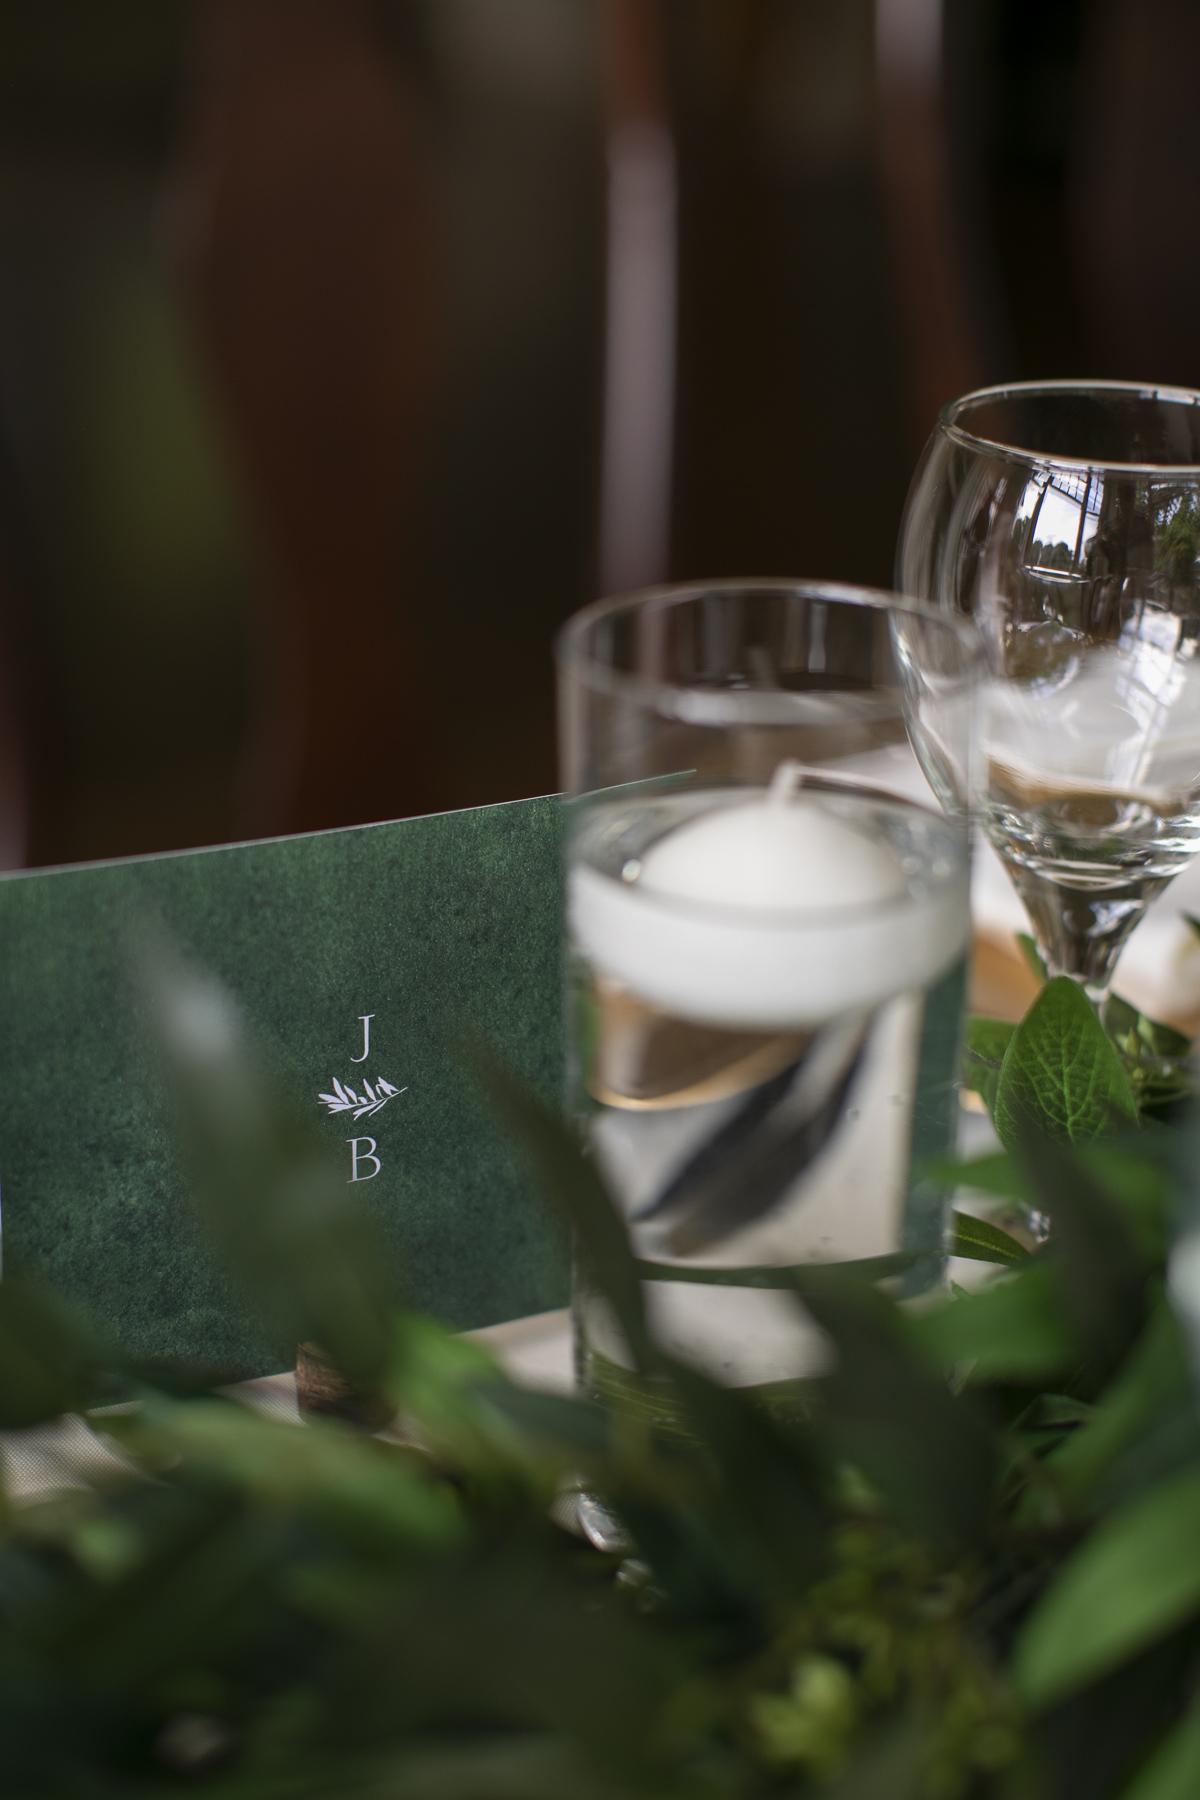 vineyard-bride-philosophy-studios-outdoor-summer-wedding-the-tamahaac-club-niagara-ancaster-toronto-vendor-0092.JPG